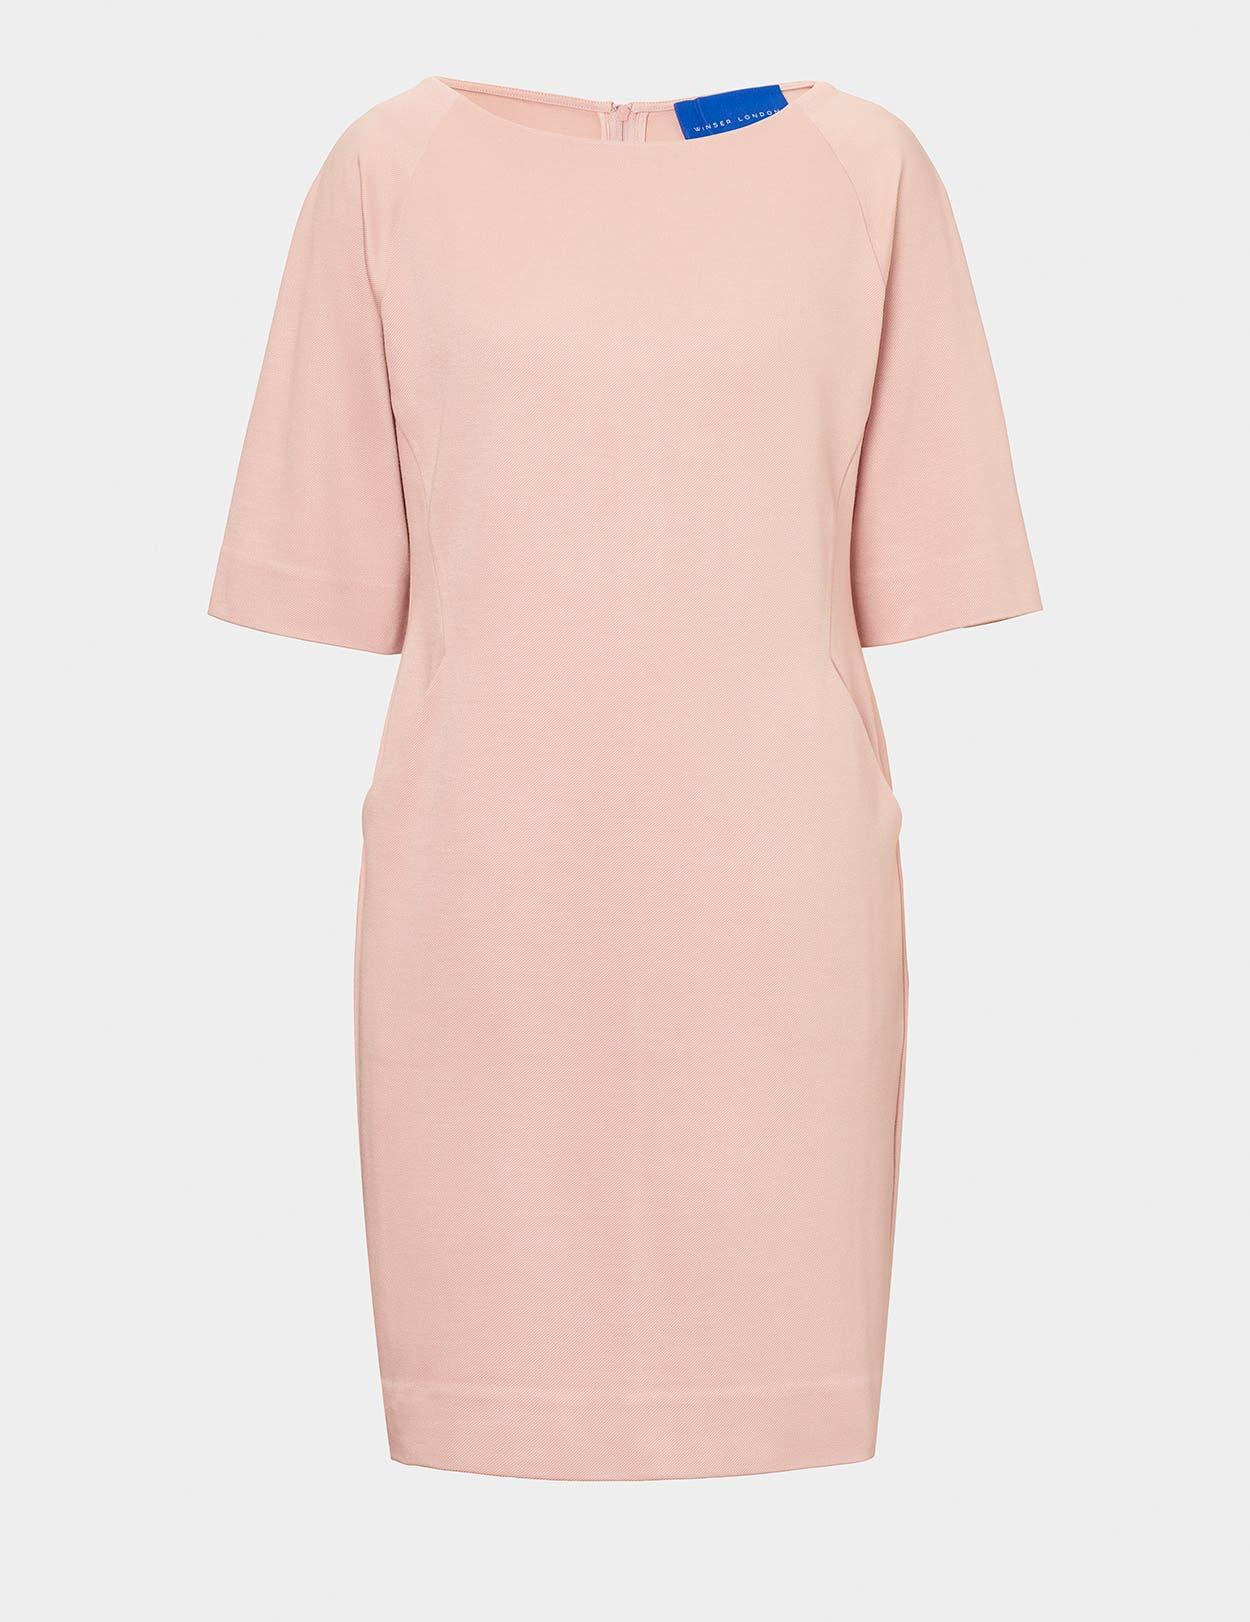 SIENNA SHIFT DRESS